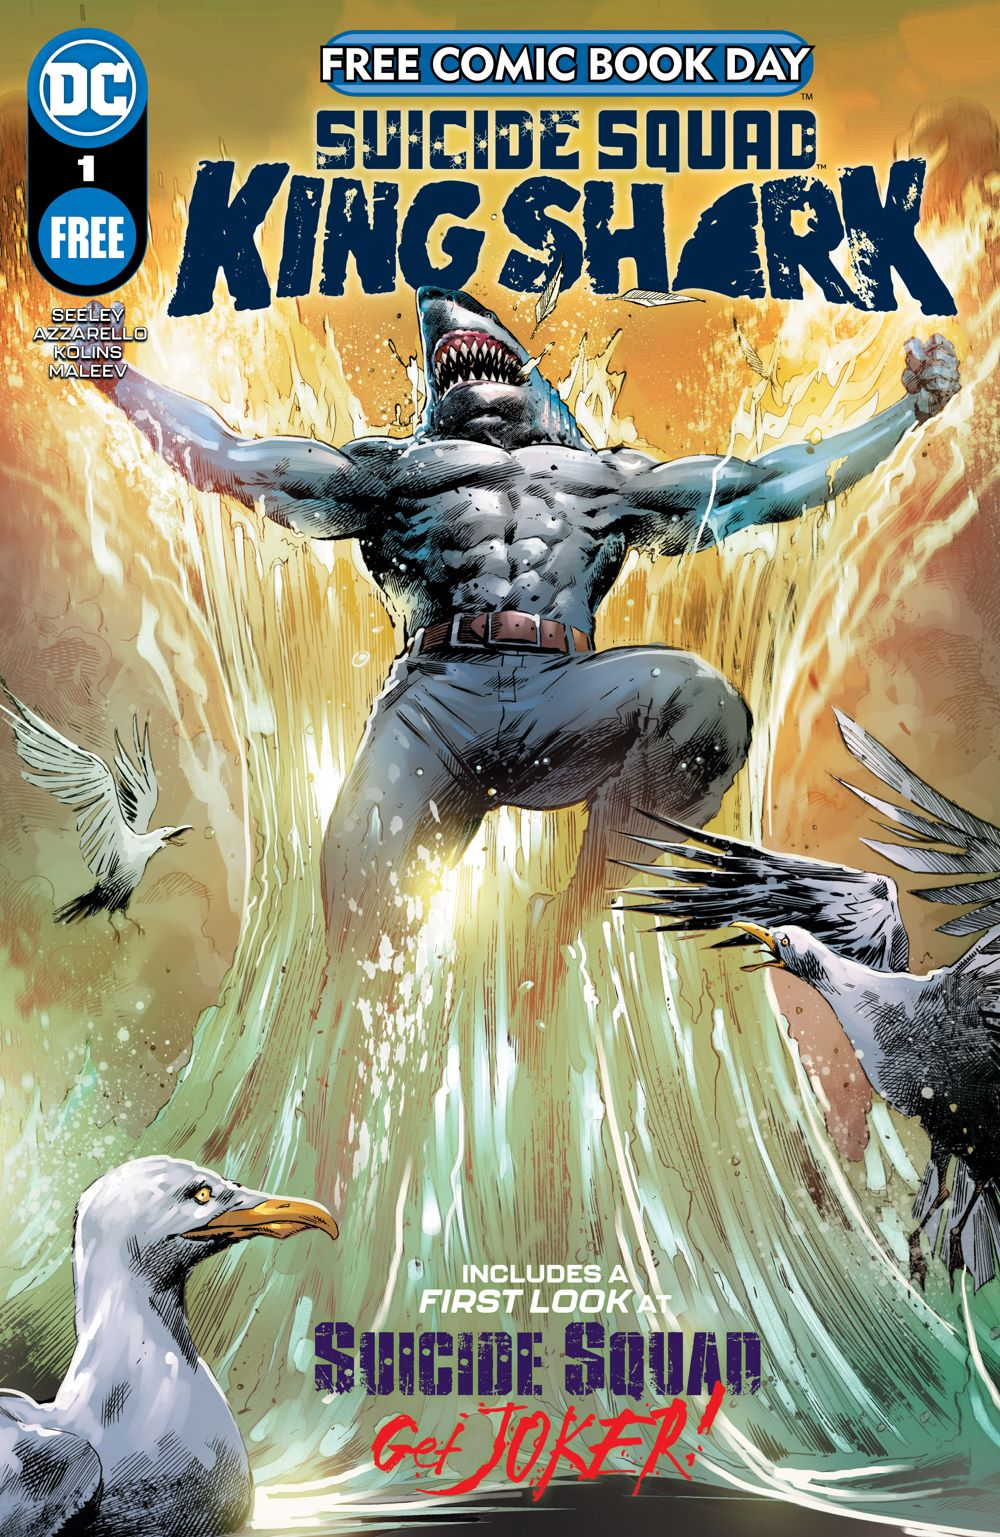 FCBD2021_BMSSSE_Cv1_SS DC Comics August 2021 Solicitations